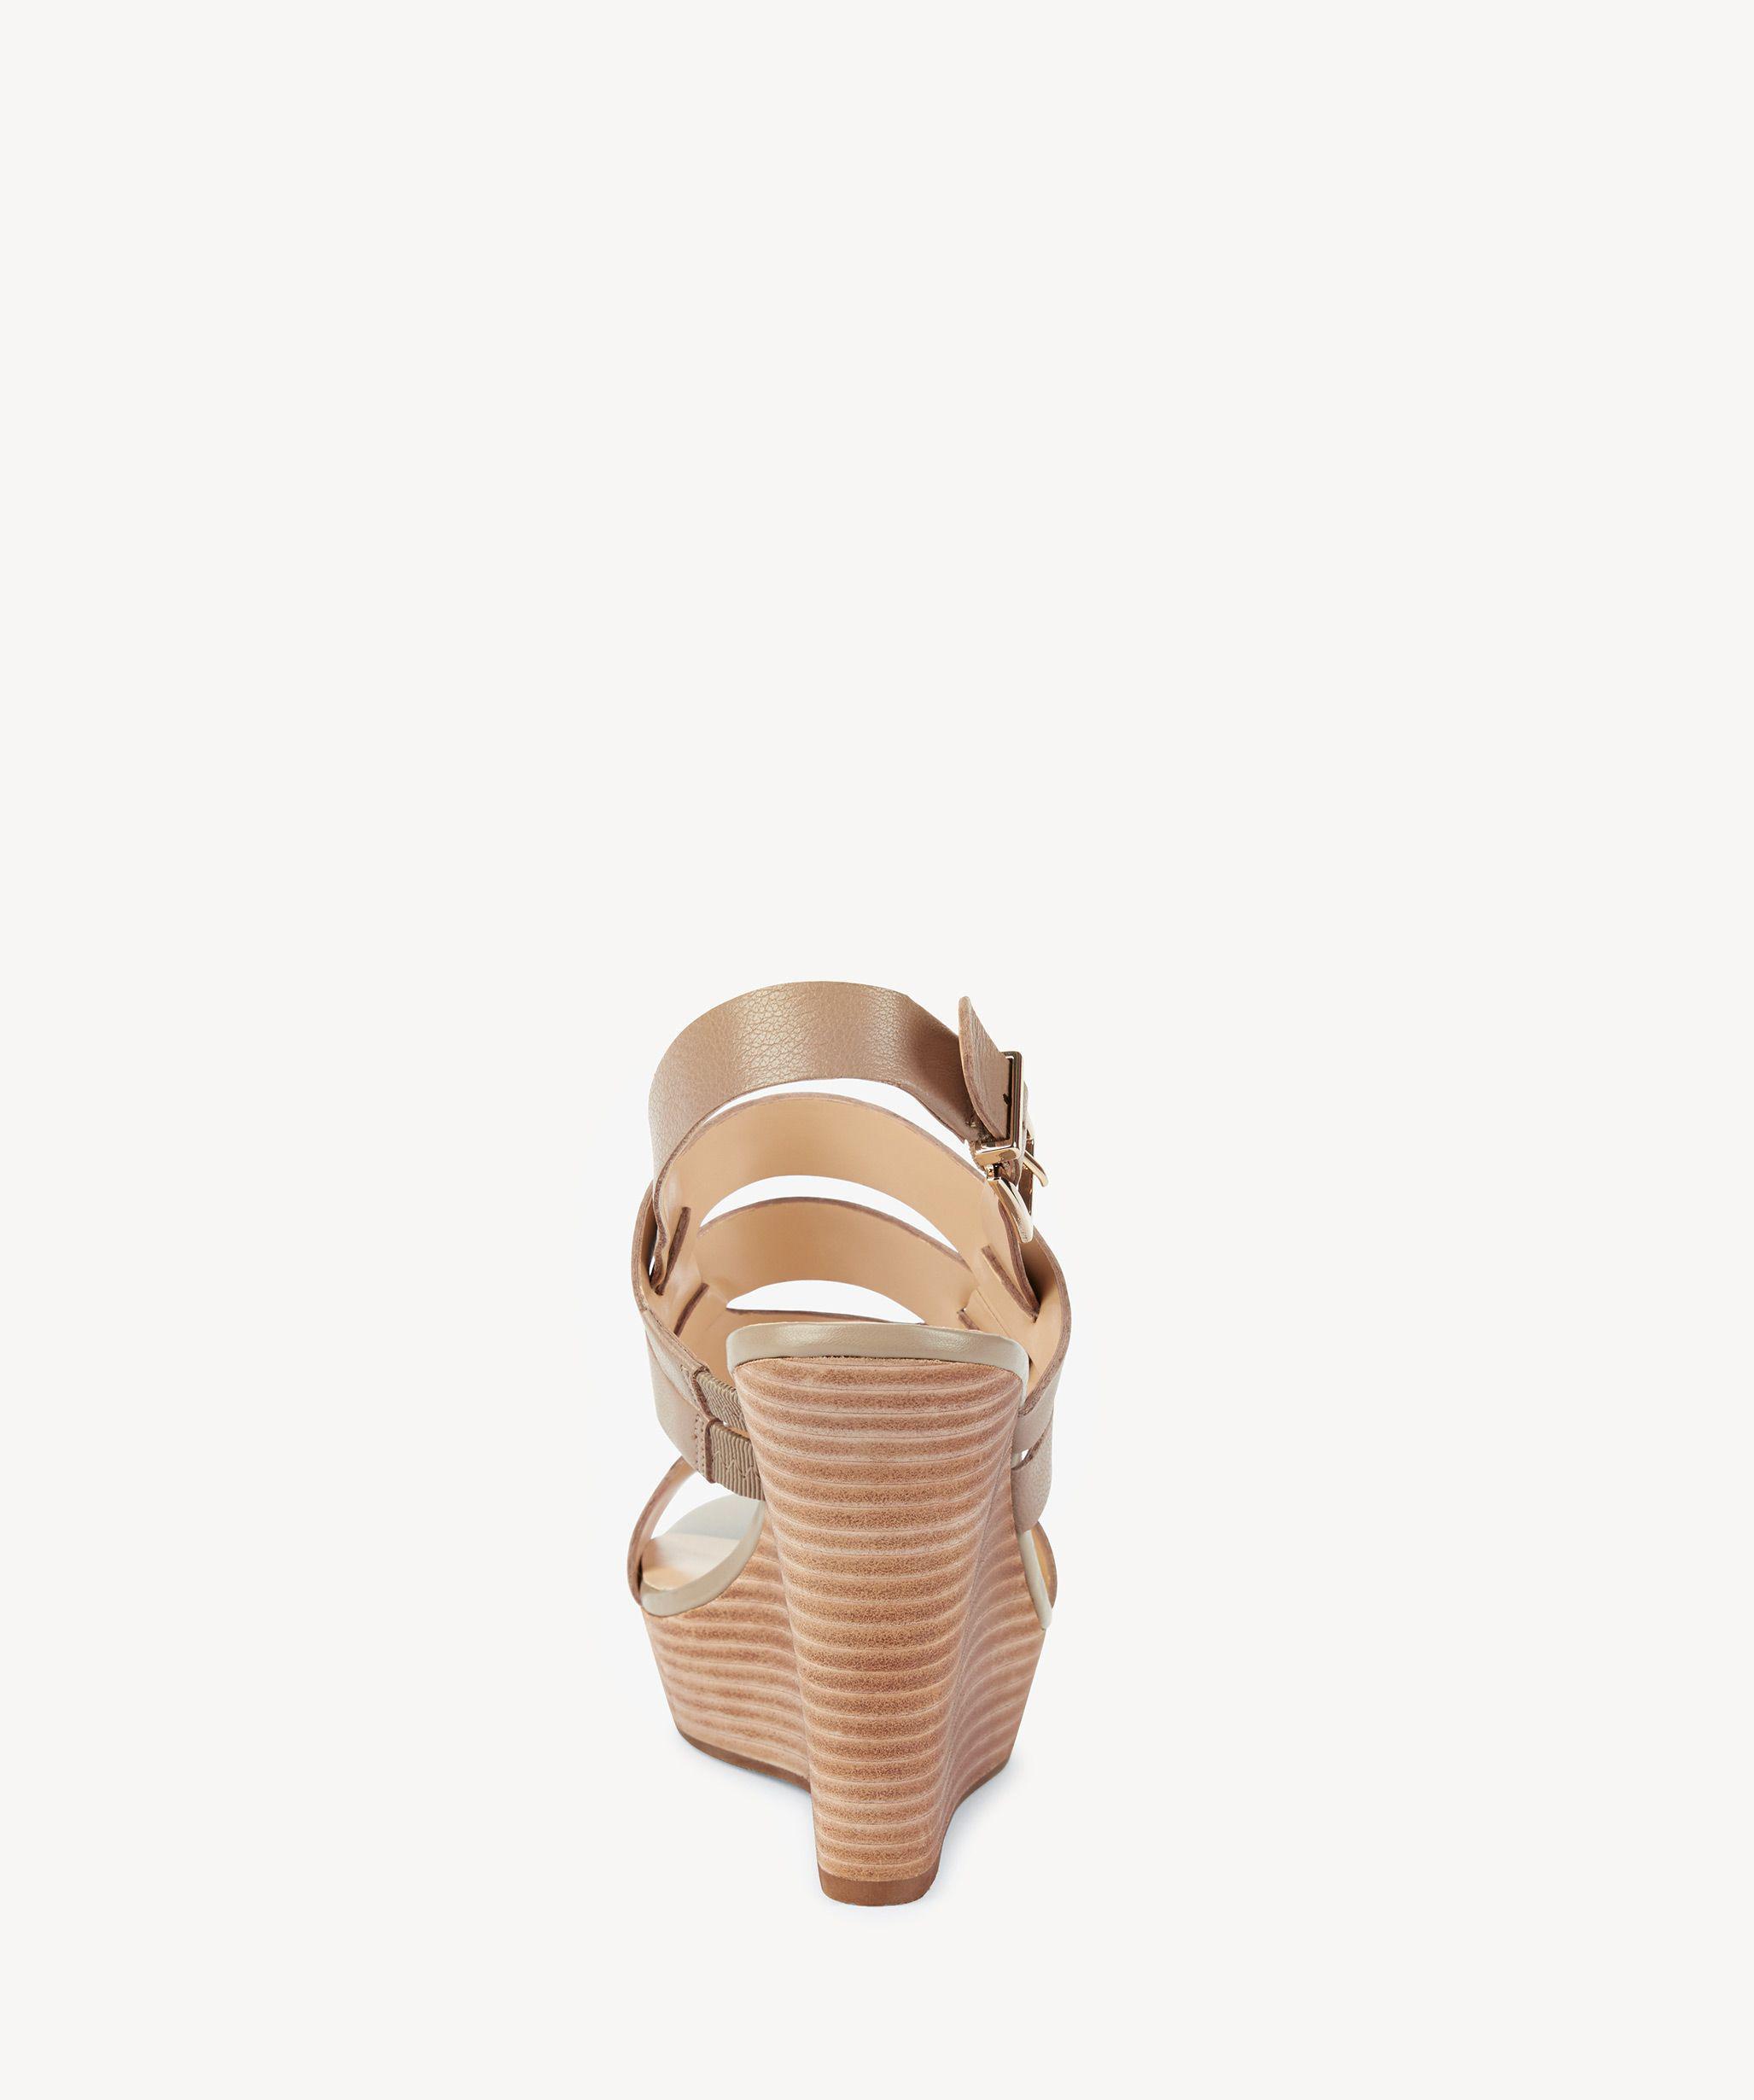 460d21900c0d Lyst - Sole Society Jenny Platform Wedge Sandal